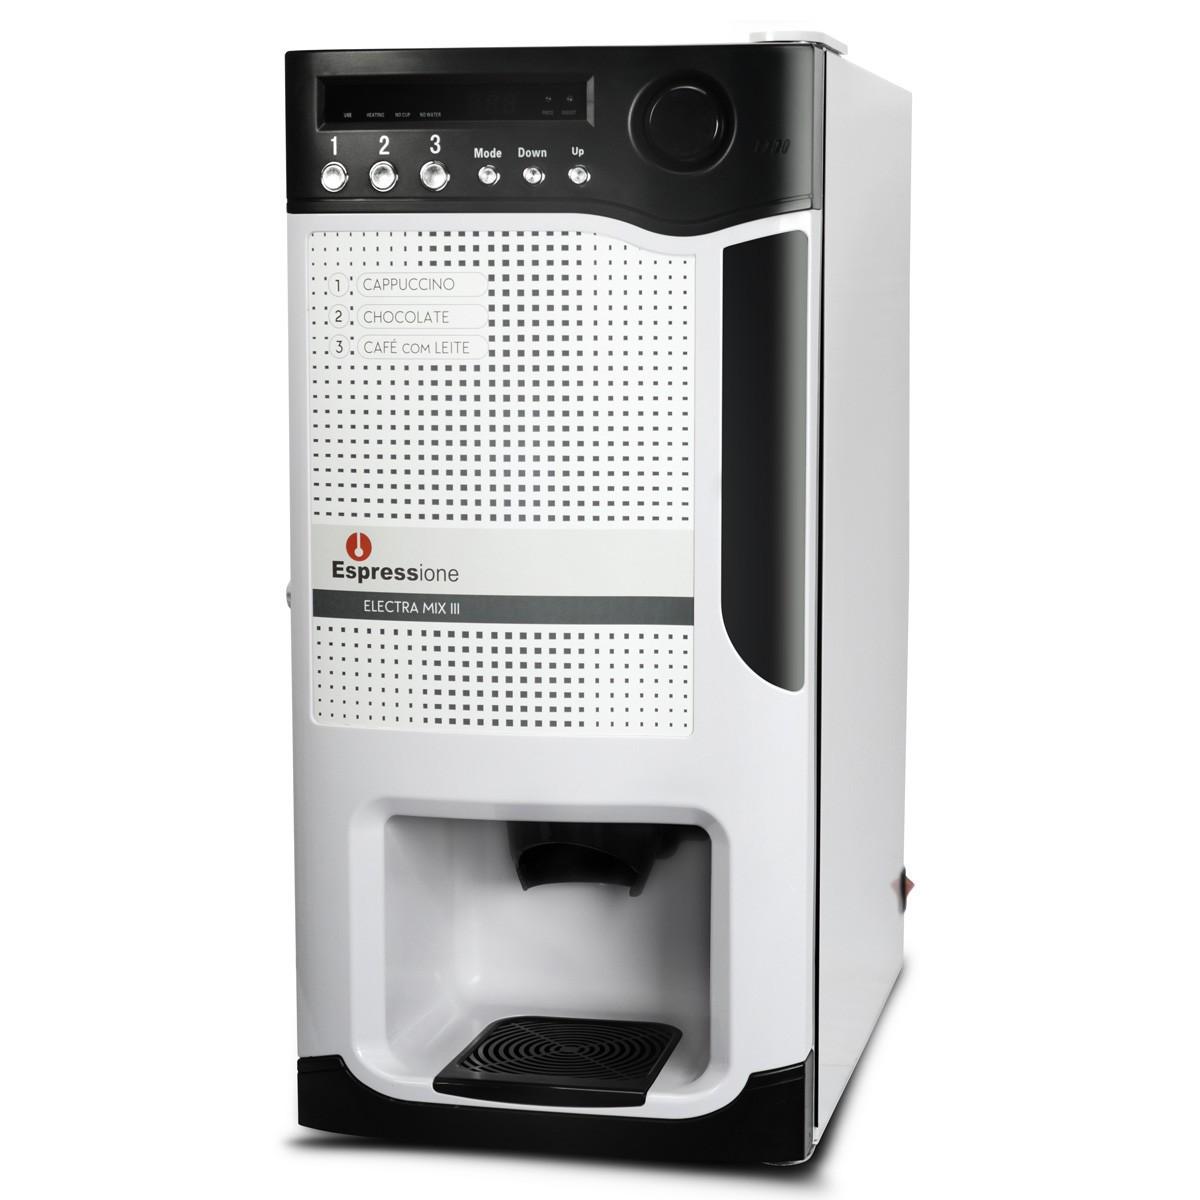 Máquina Electra Mix III Versão Solúvel Espressione Branca